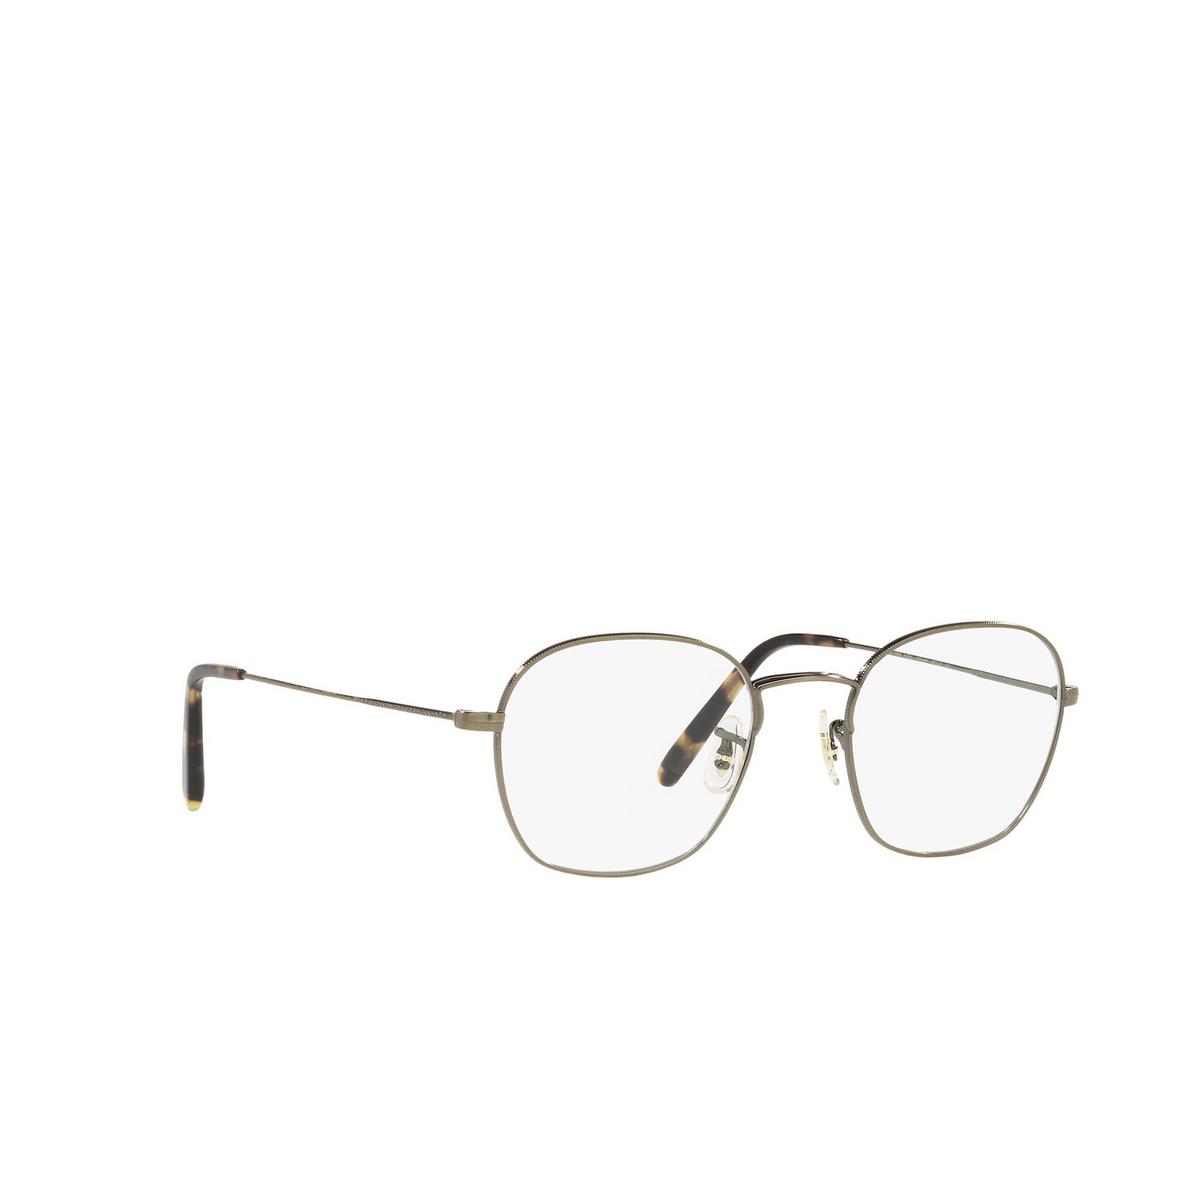 Oliver Peoples® Round Eyeglasses: Allinger OV1284 color Antique Gold 5284 - three-quarters view.